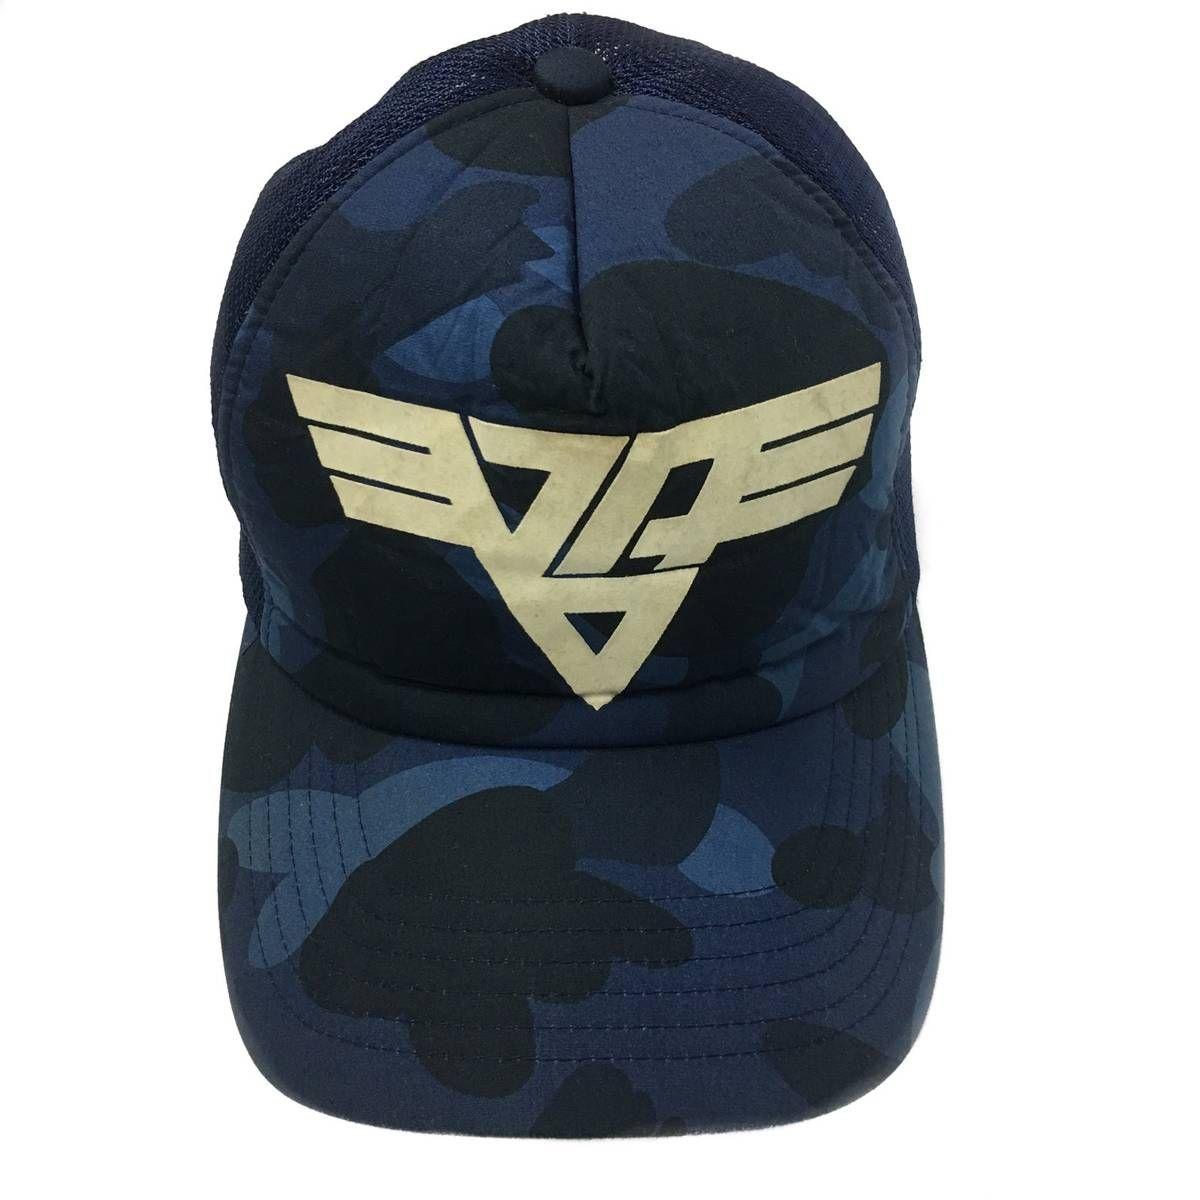 Bape BAPE A Bathing Ape Navy Blue Camouflage Trucker Hat Cap 100% Authentic  Size one size - Hats for Sale - Grailed 99942f542